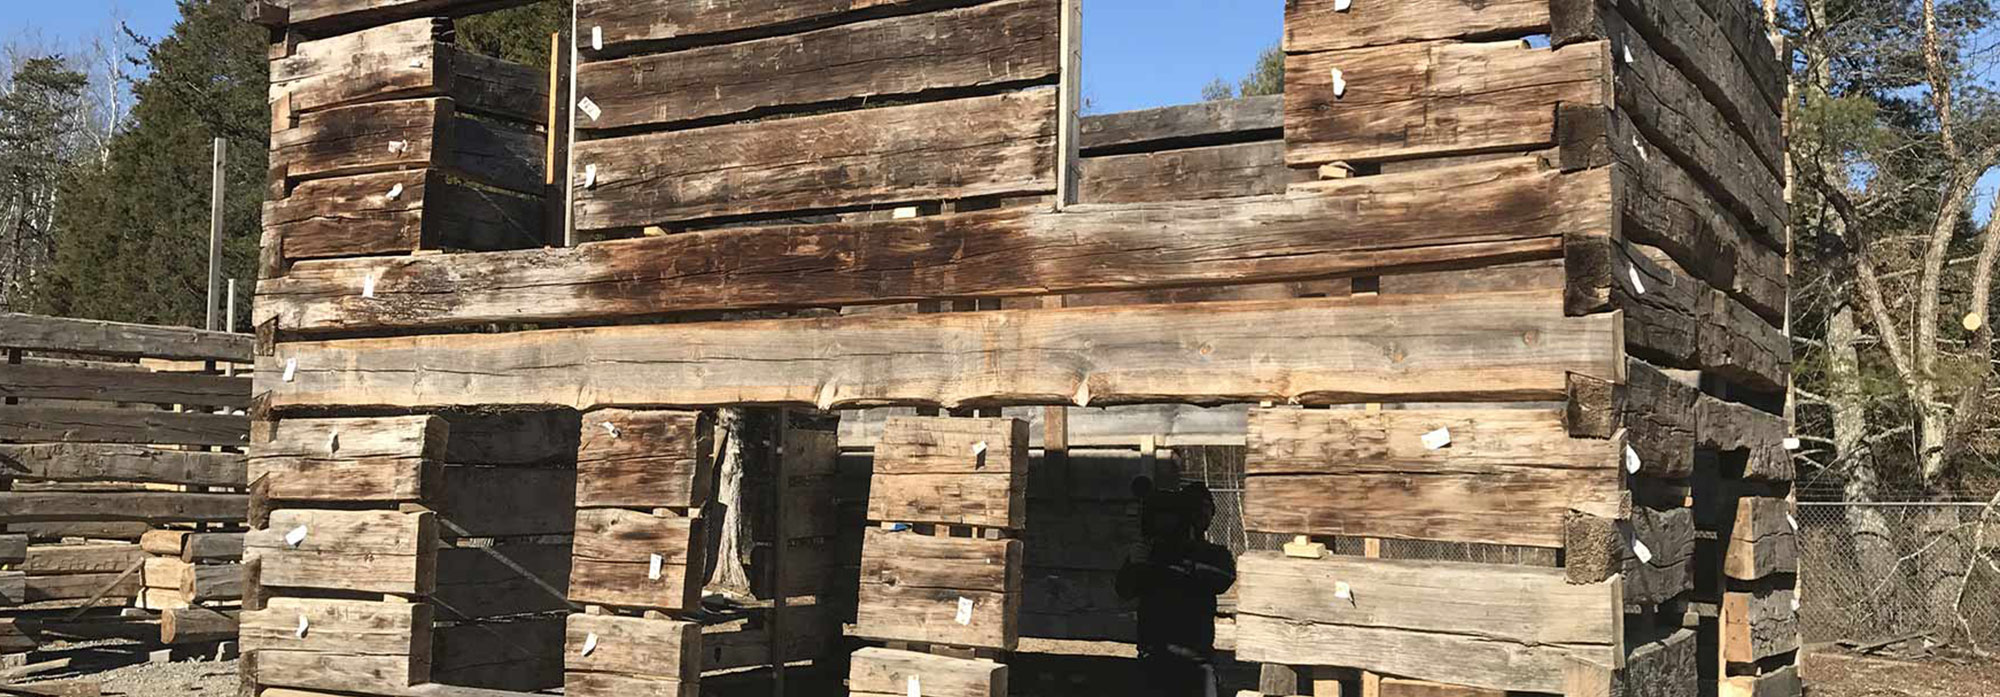 Texas Boneyard Coming This Fall Barnwood Living